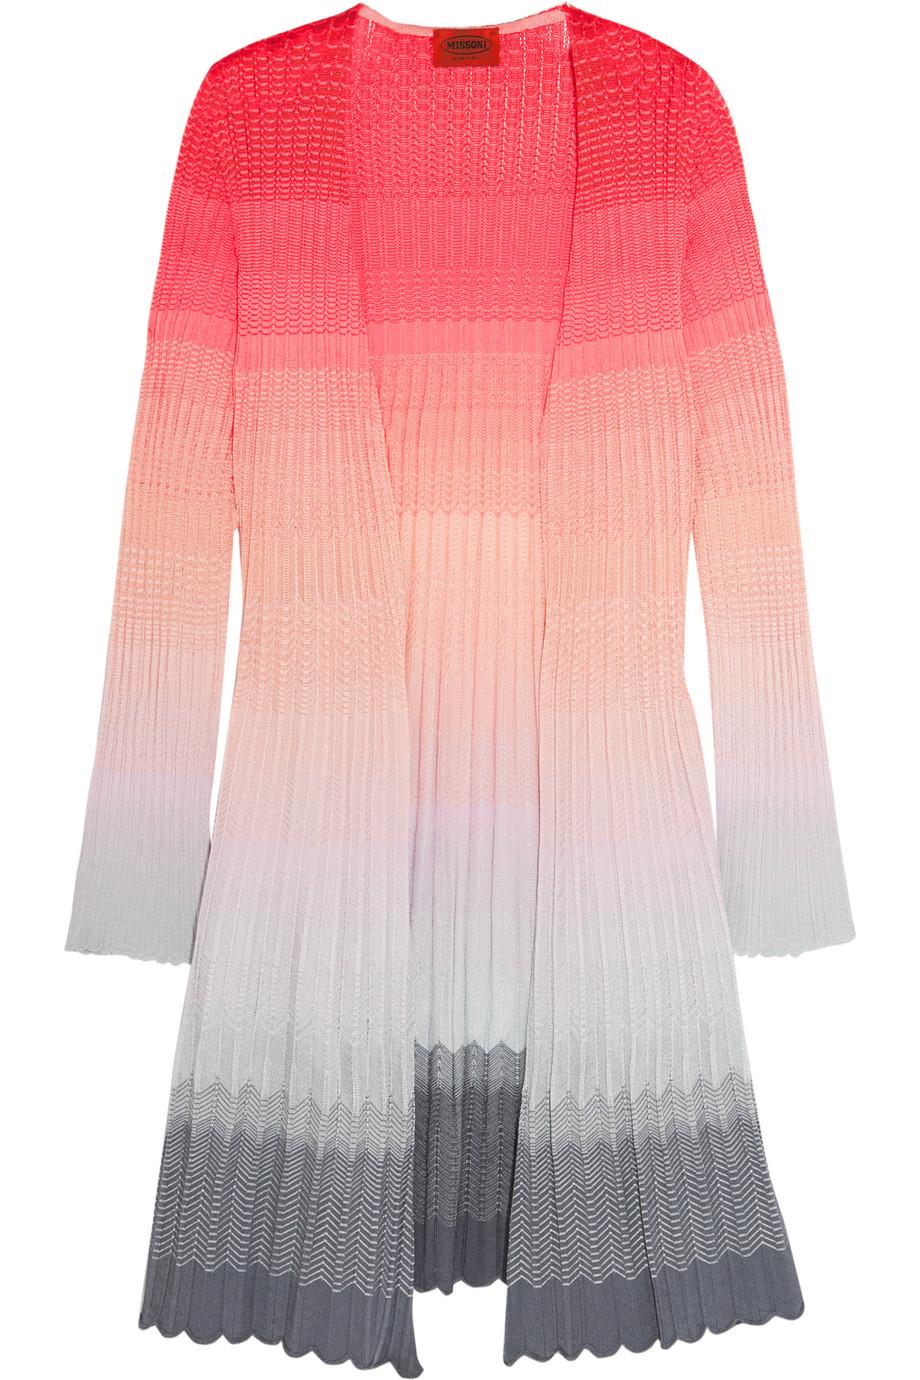 Missoni Ombré Crochet-Knit Cardigan, Pink/Gray, Women's, Size: 44